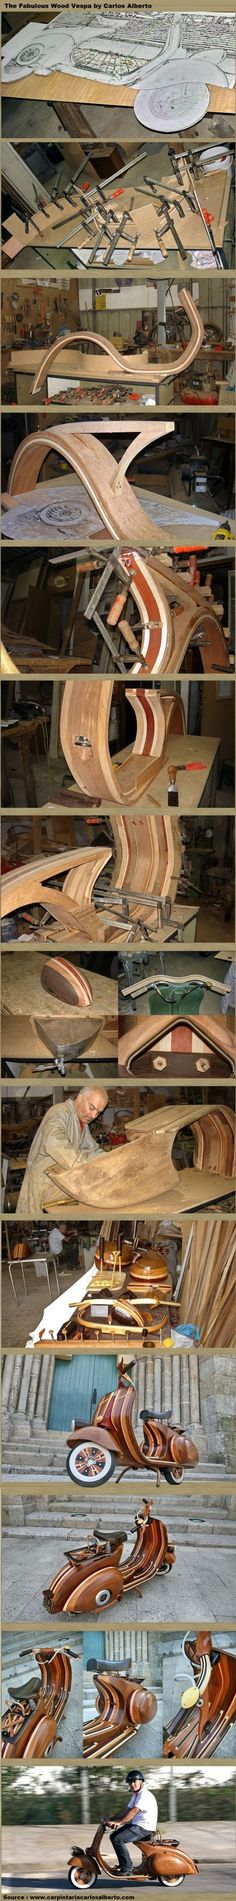 The Fabulous Wood Vespa by Carlos Alberto